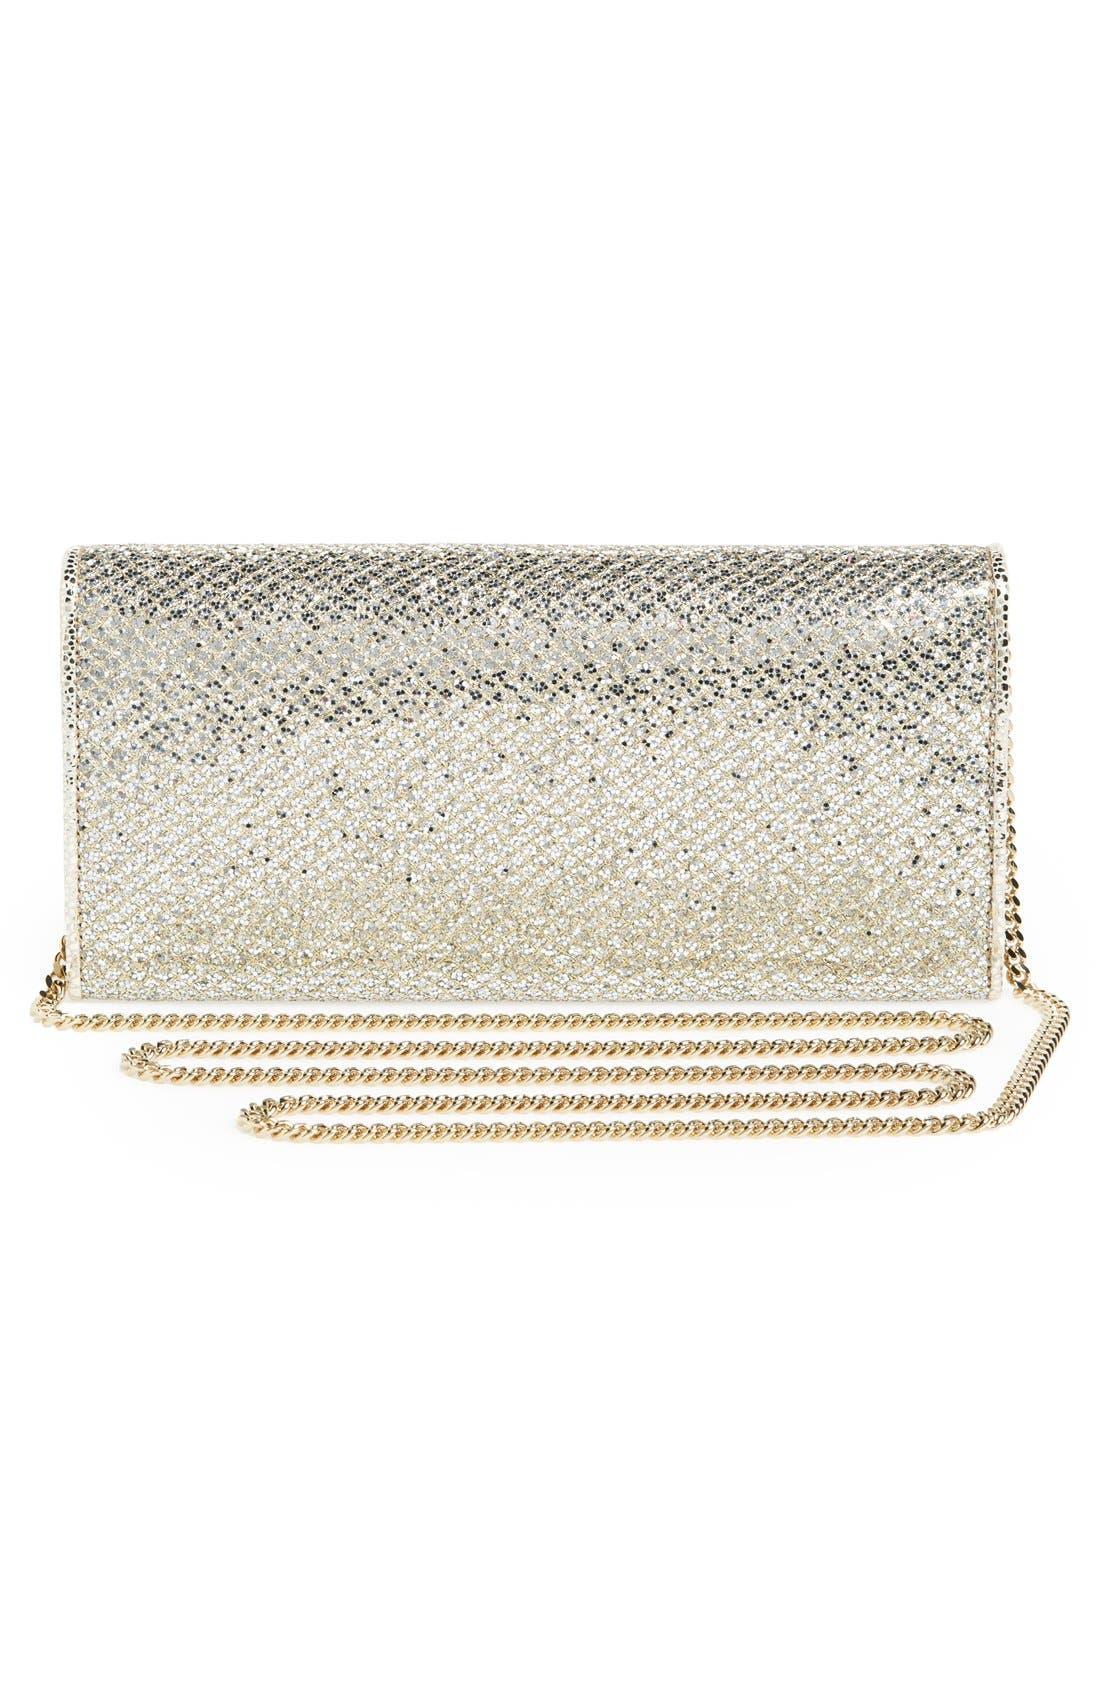 Alternate Image 3  - Jimmy Choo 'Milla' Glitter Wallet on a Chain